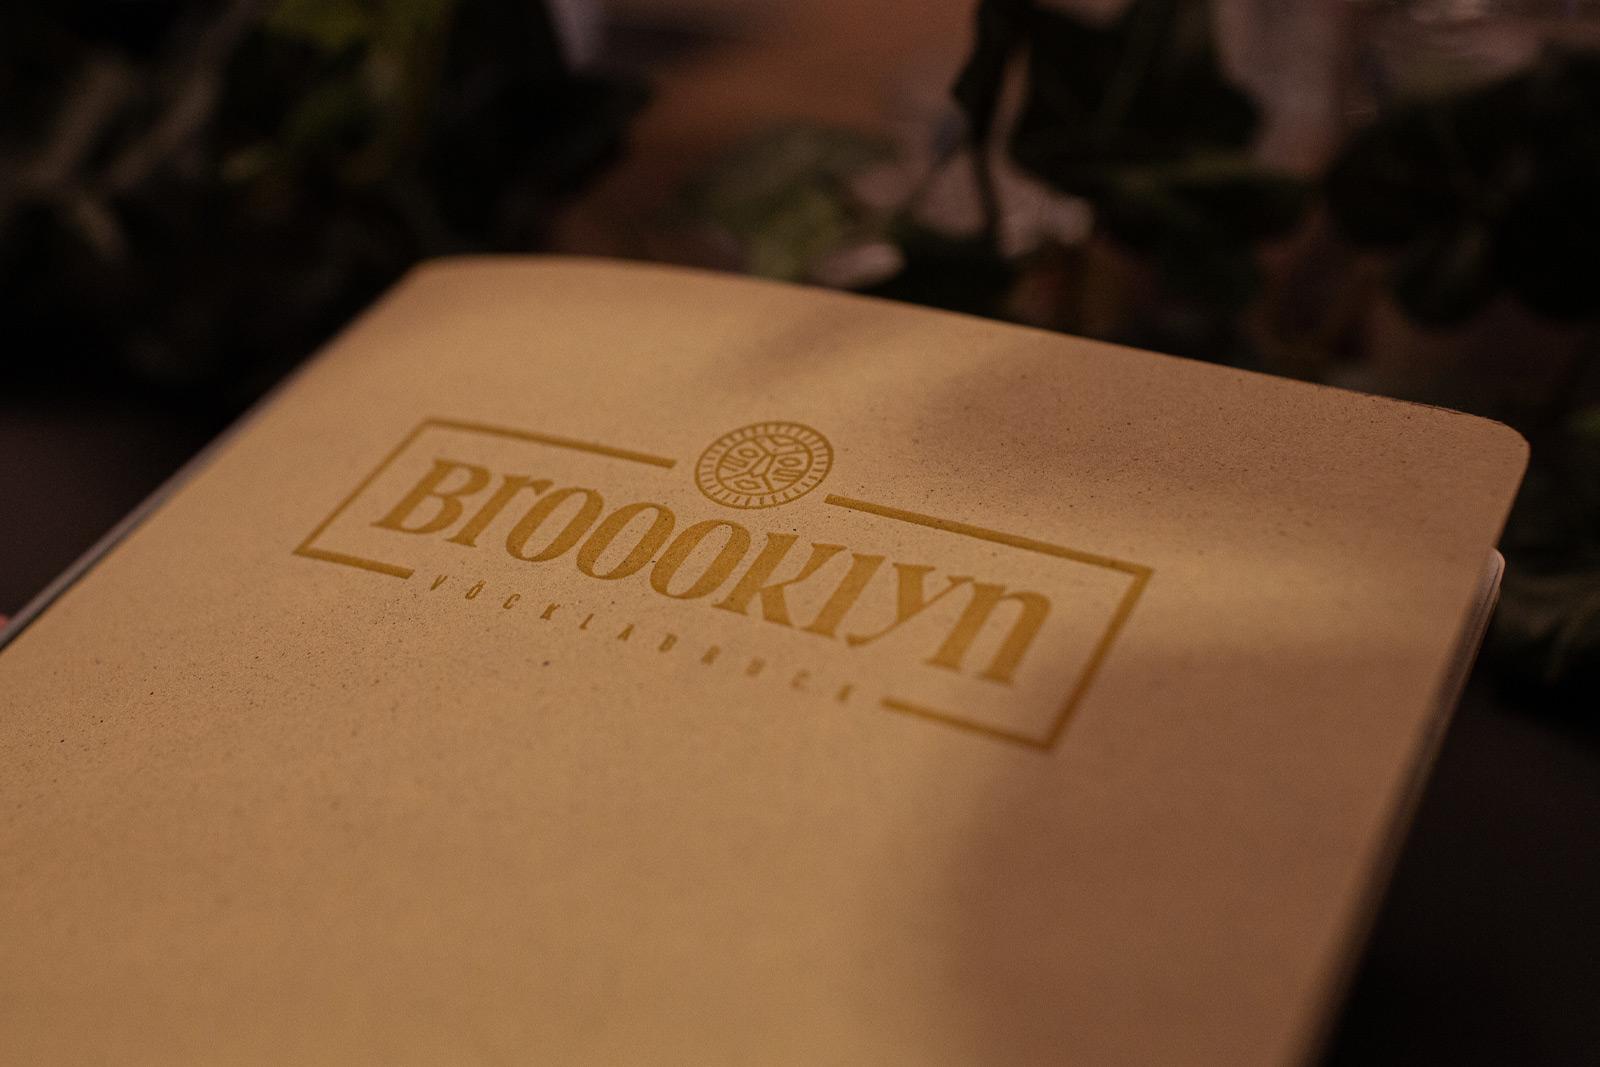 menue-branding_broooklyn-anti-form-michael-schumer